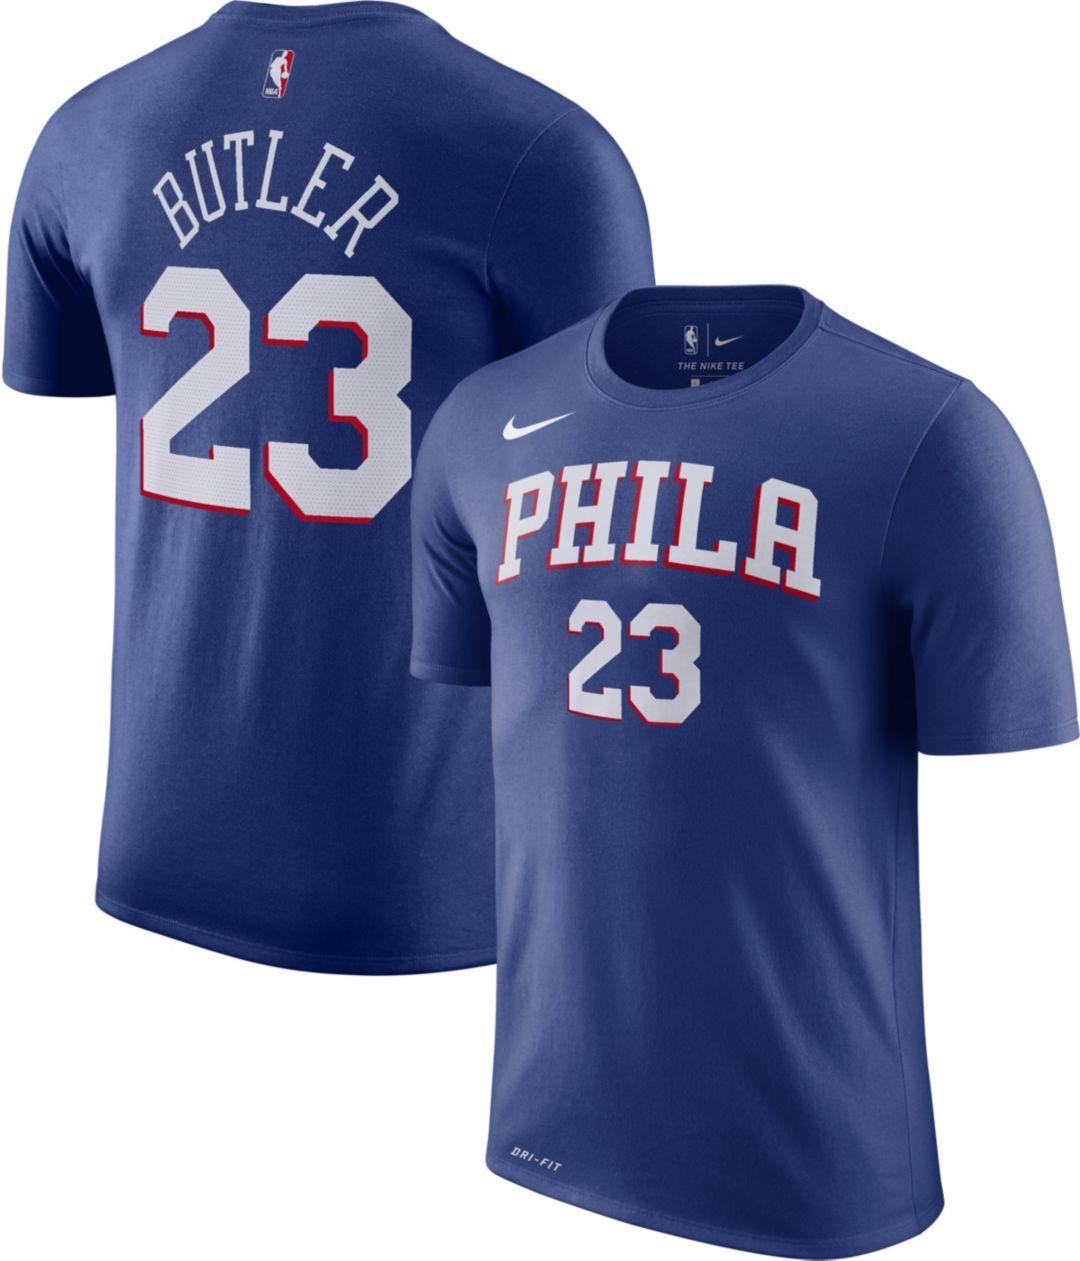 388caff9fdd Nike Youth Philadelphia 76ers Jimmy Butler #23 Dri-FIT Royal T-Shirt ...